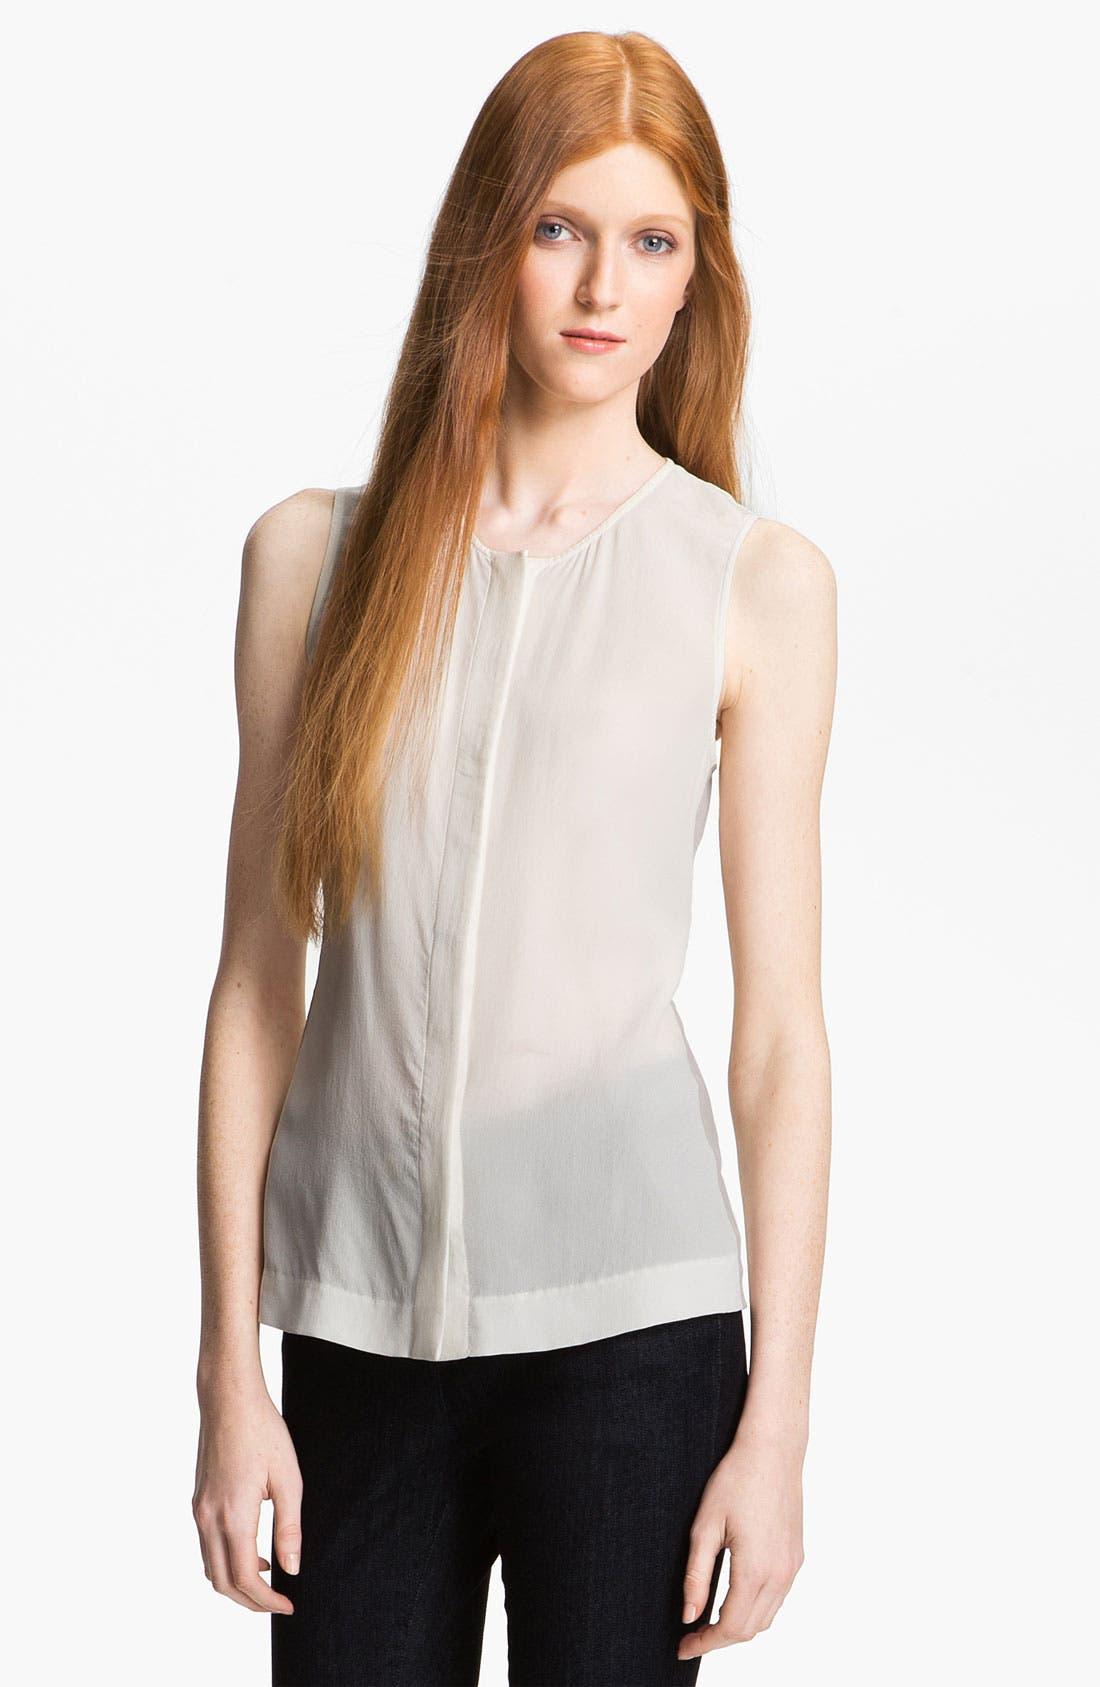 Alternate Image 1 Selected - Rachel Zoe 'Angela' Sheer Silk Top